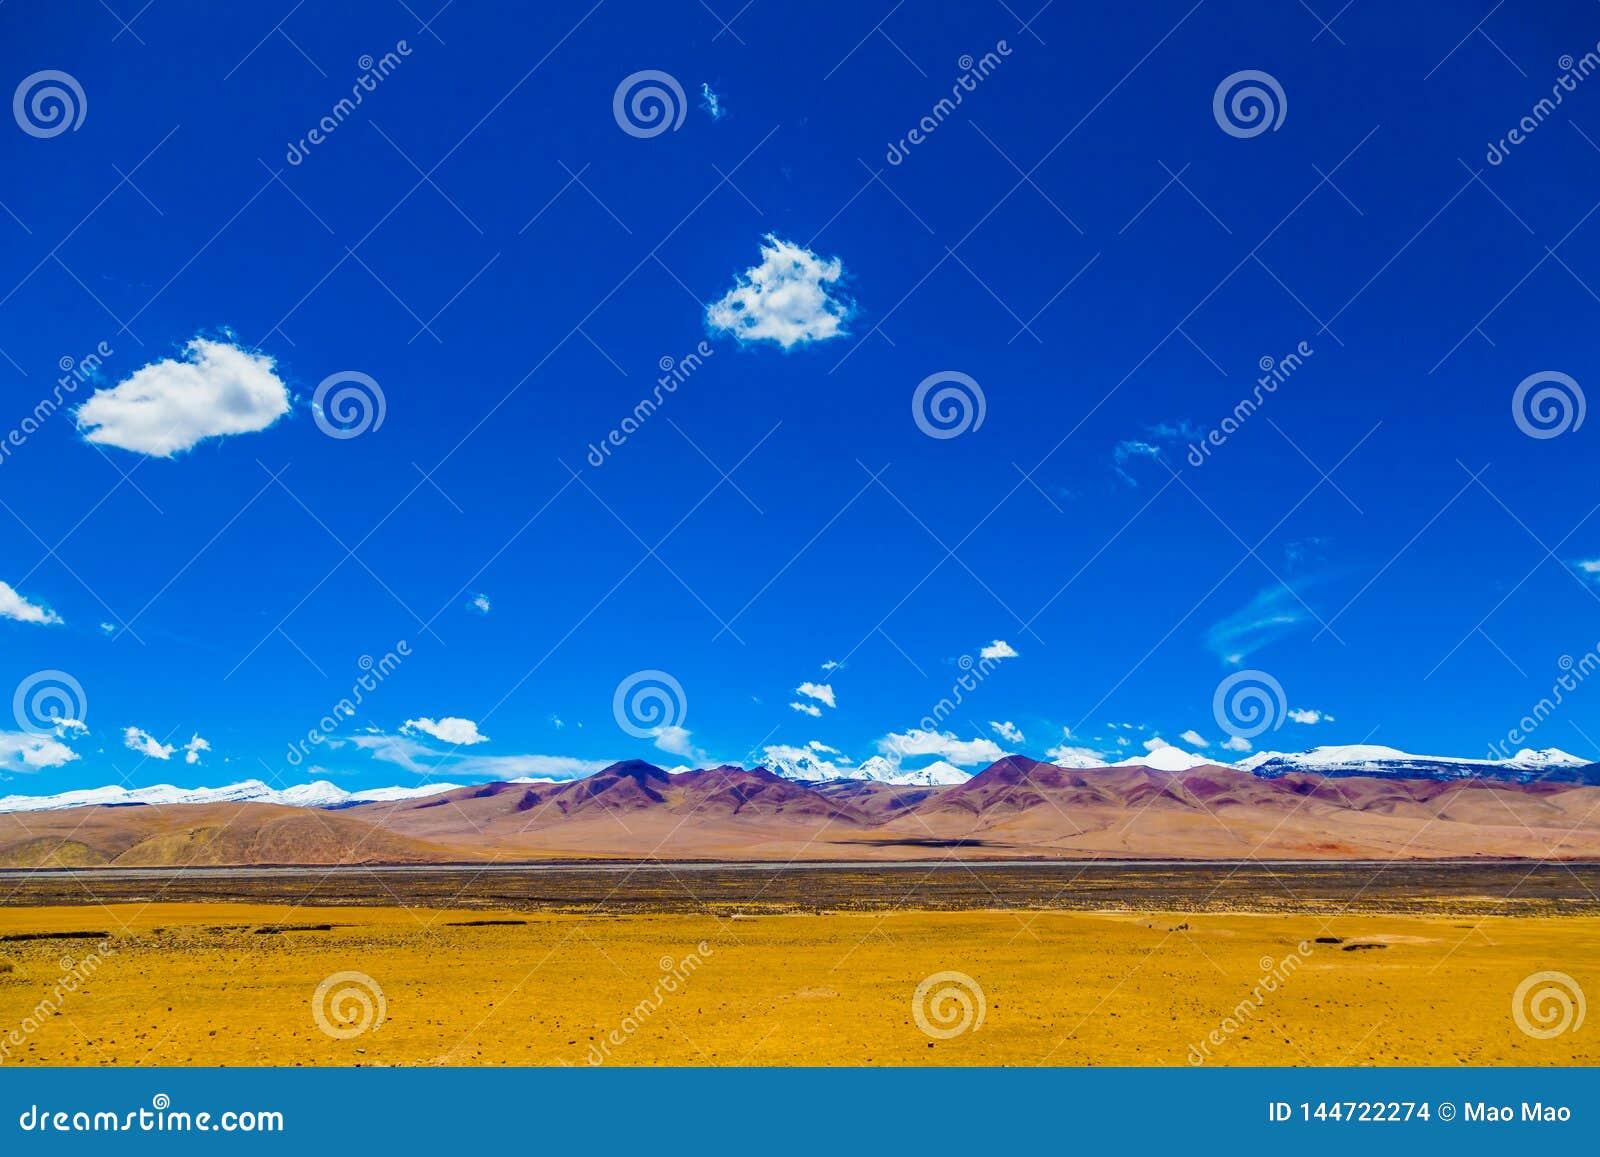 Krajobraz góra na Qinghai plateau, Chiny